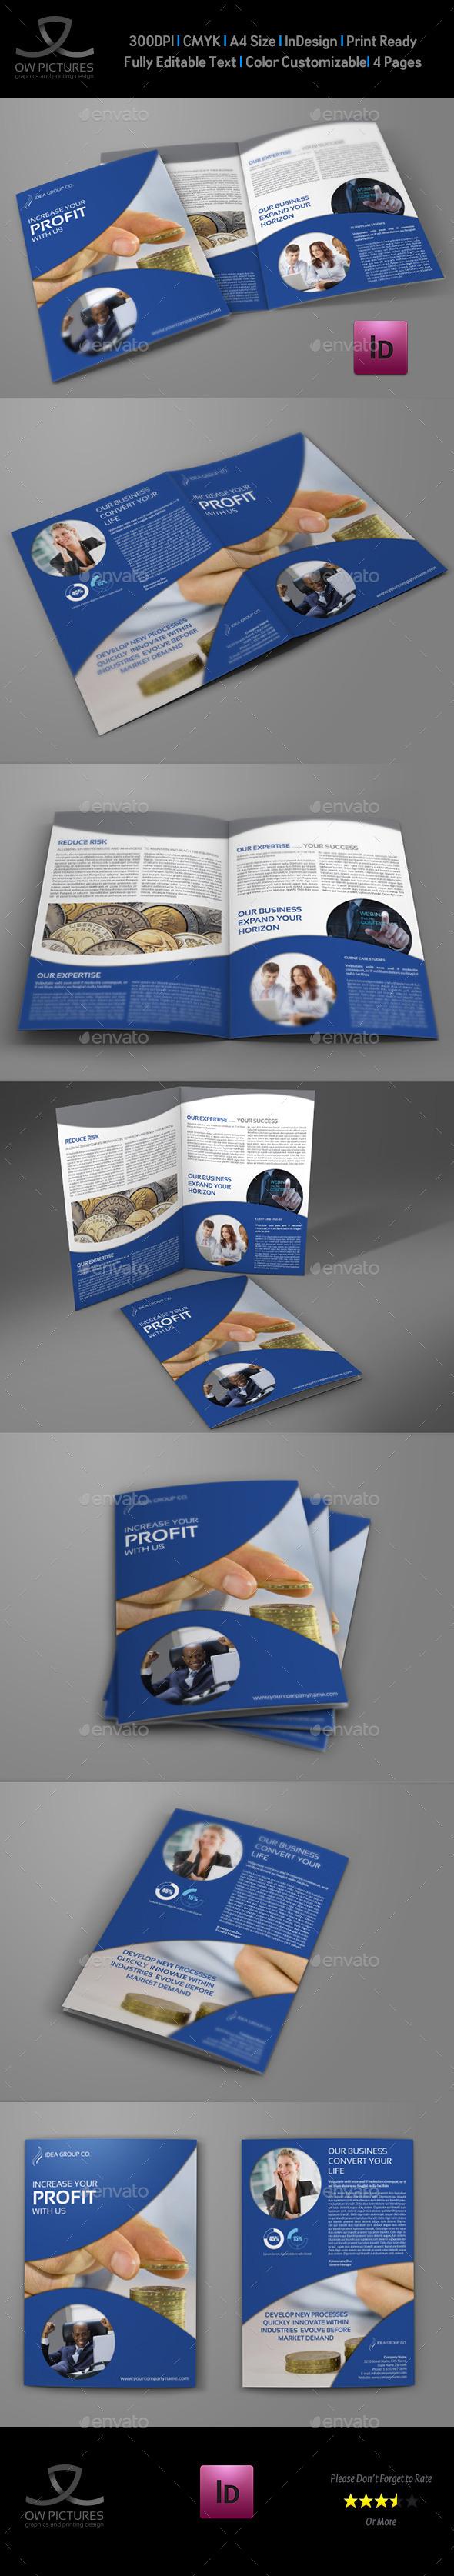 Company Brochure Bi-Fold Template Vol.30 - Corporate Brochures